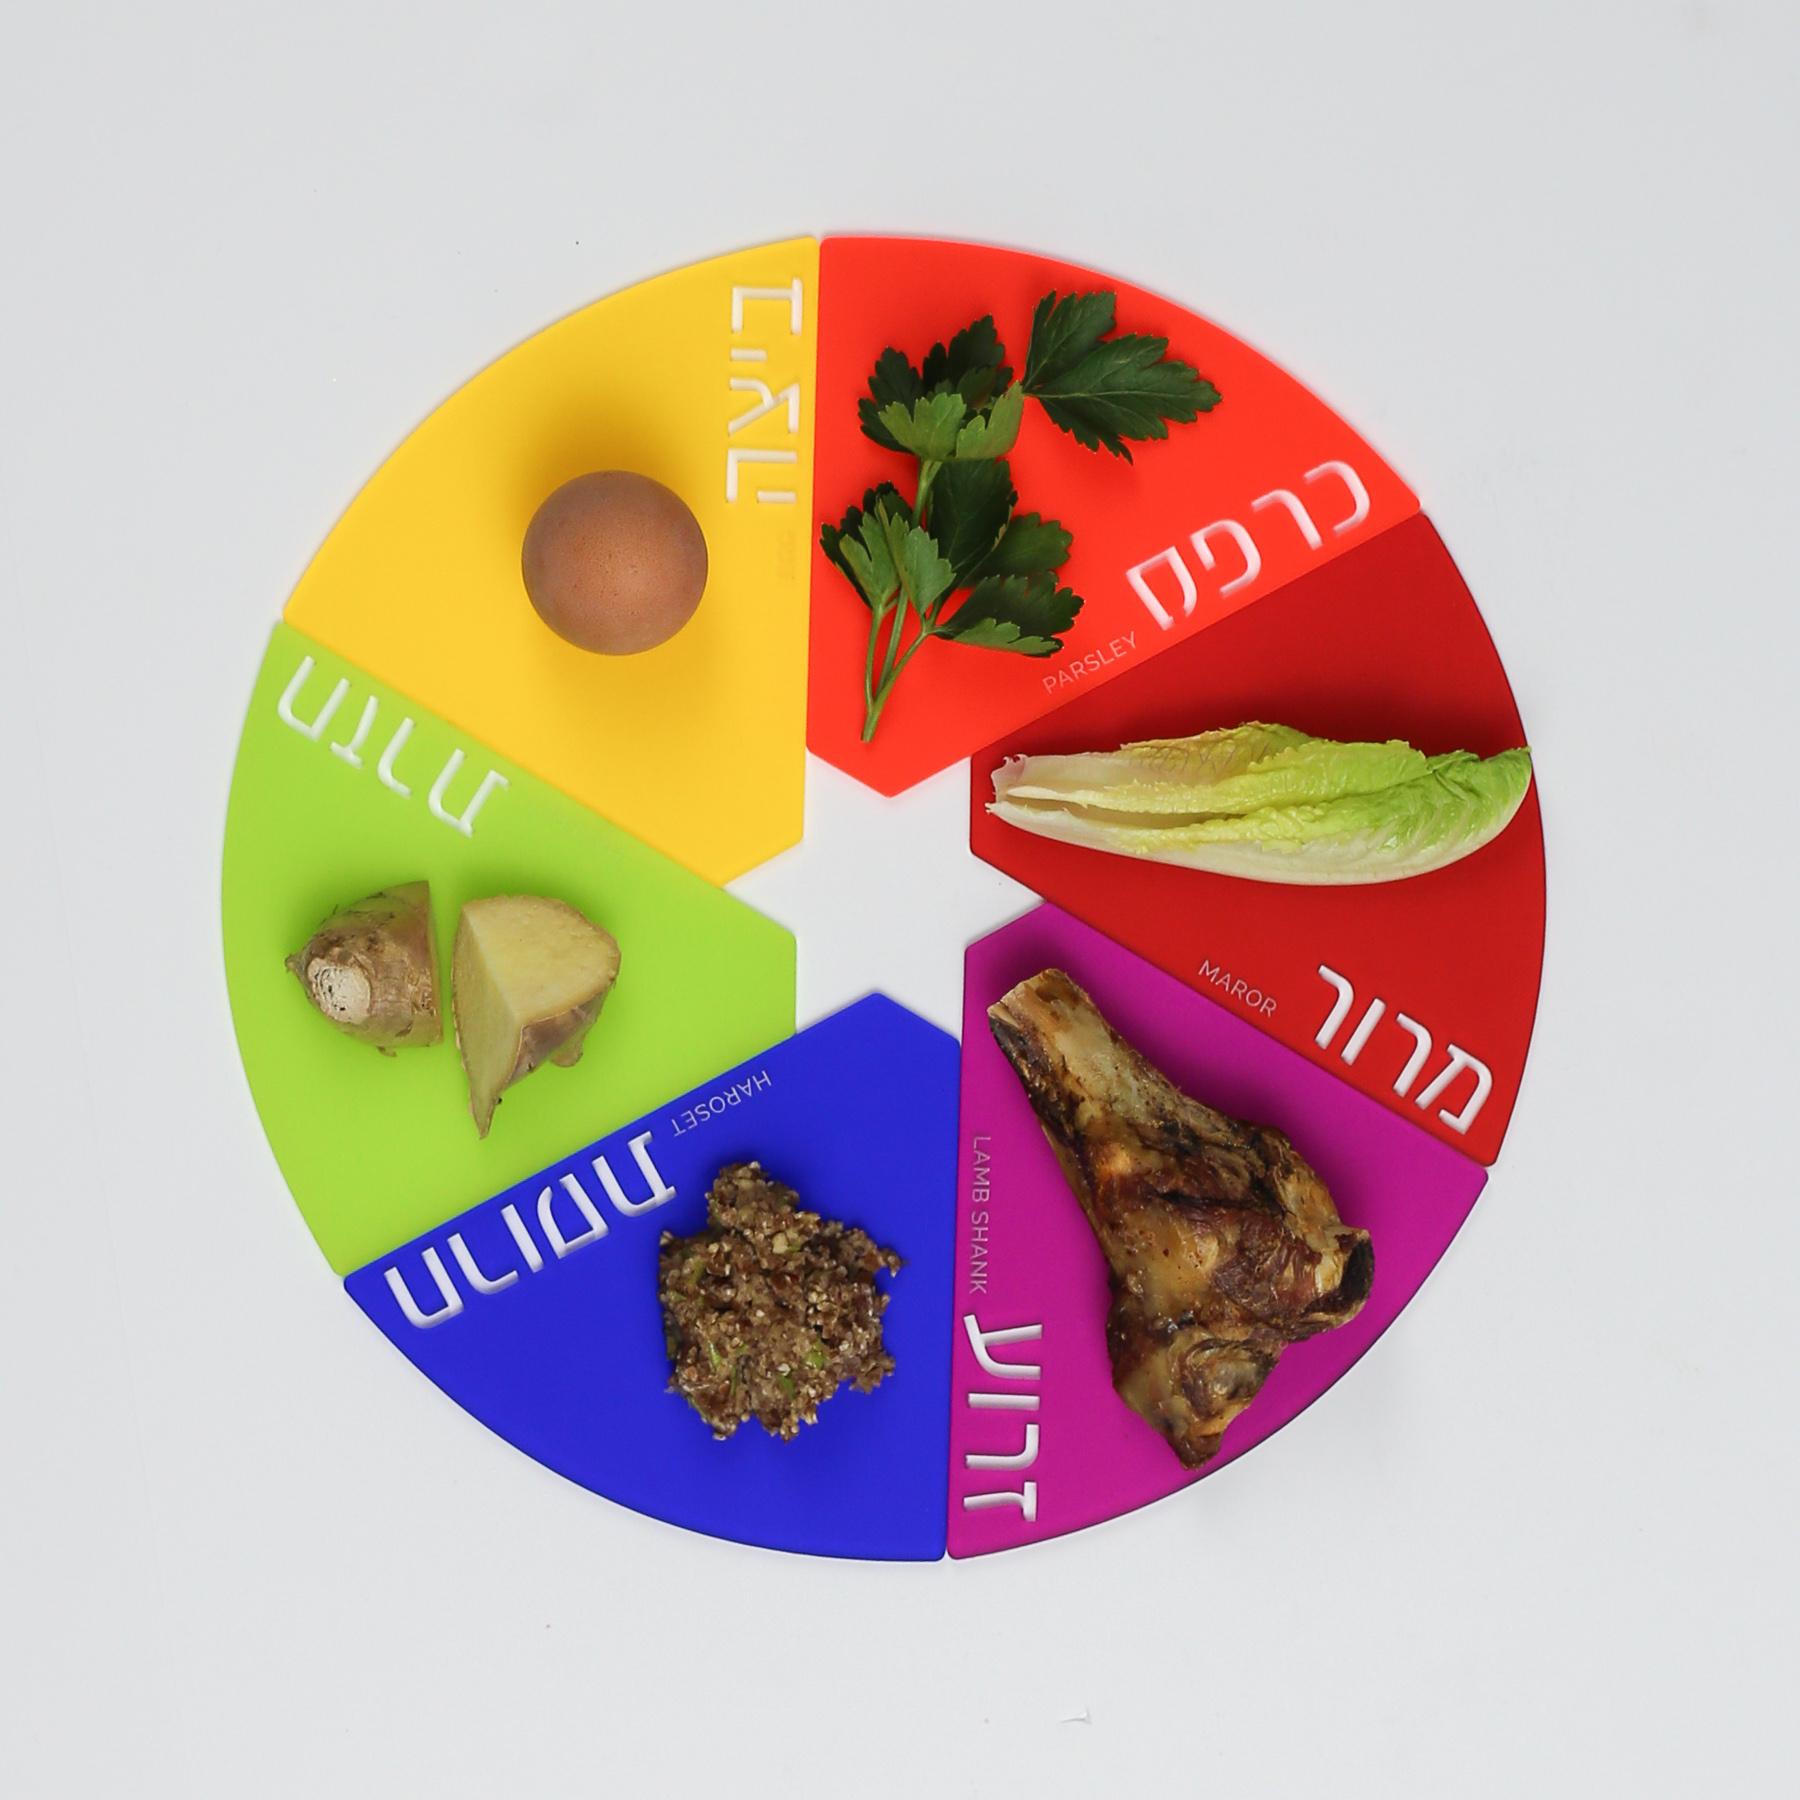 Days_Seder_Plate_1.jpg